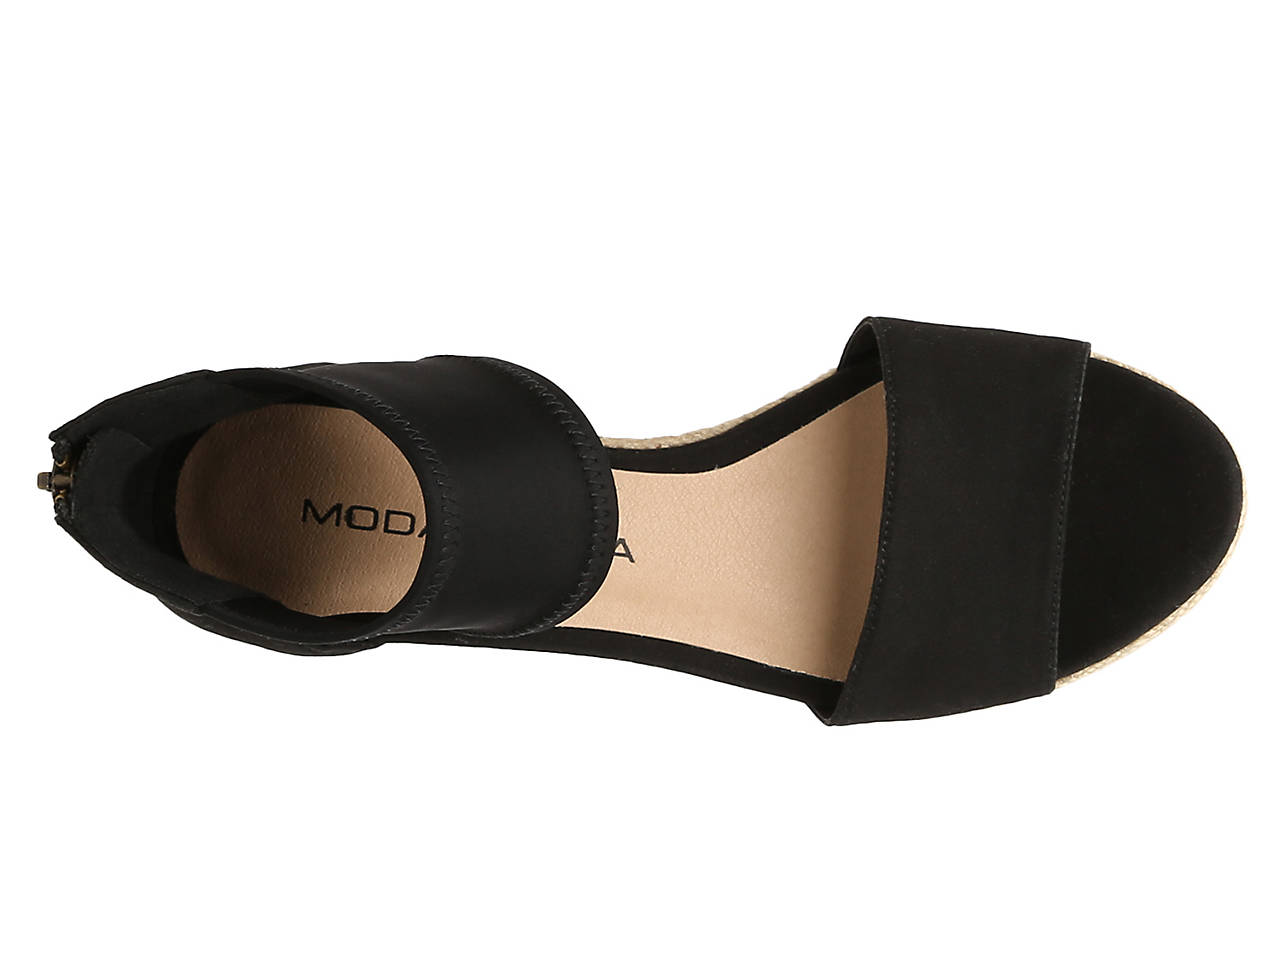 614a1c02772b Moda Spana Kacy Wedge Sandal Women s Shoes